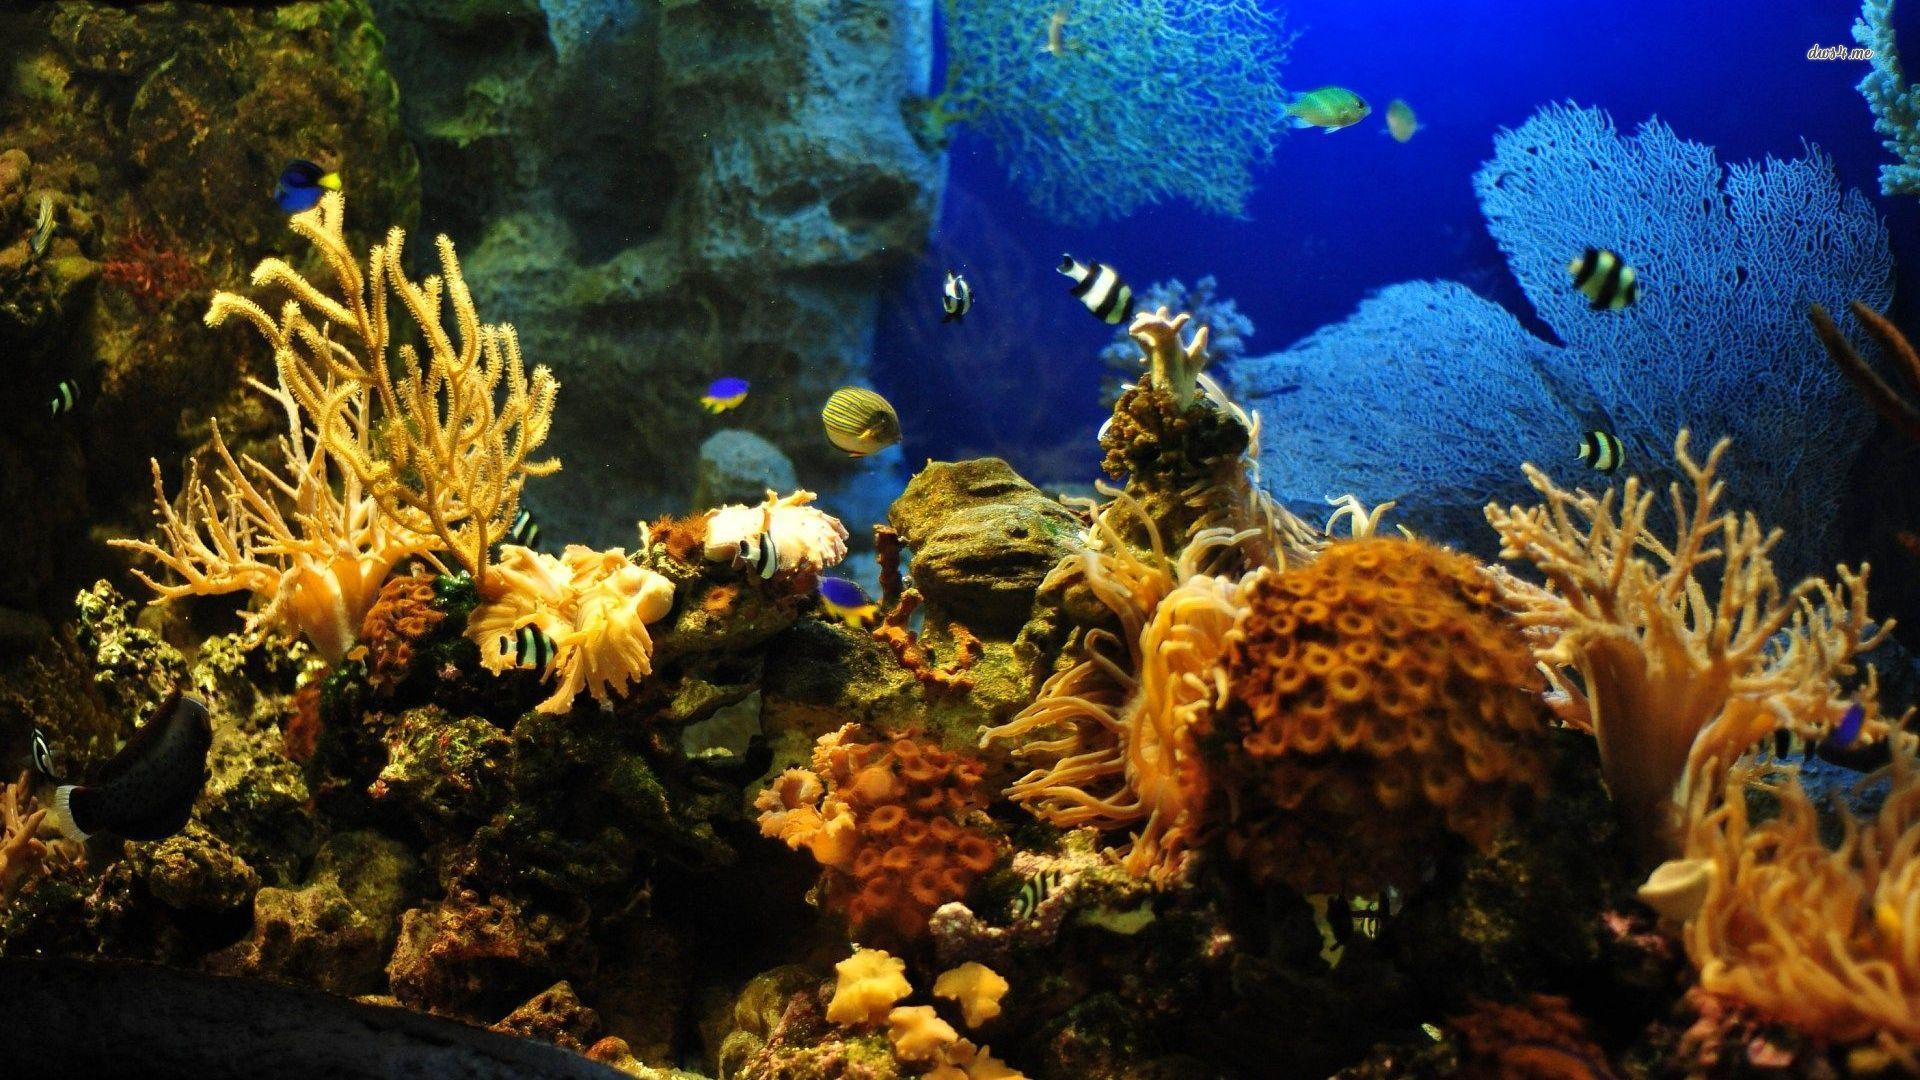 tropical, wallpaper, animal, aquarium, fish, resimleri, akvaryum